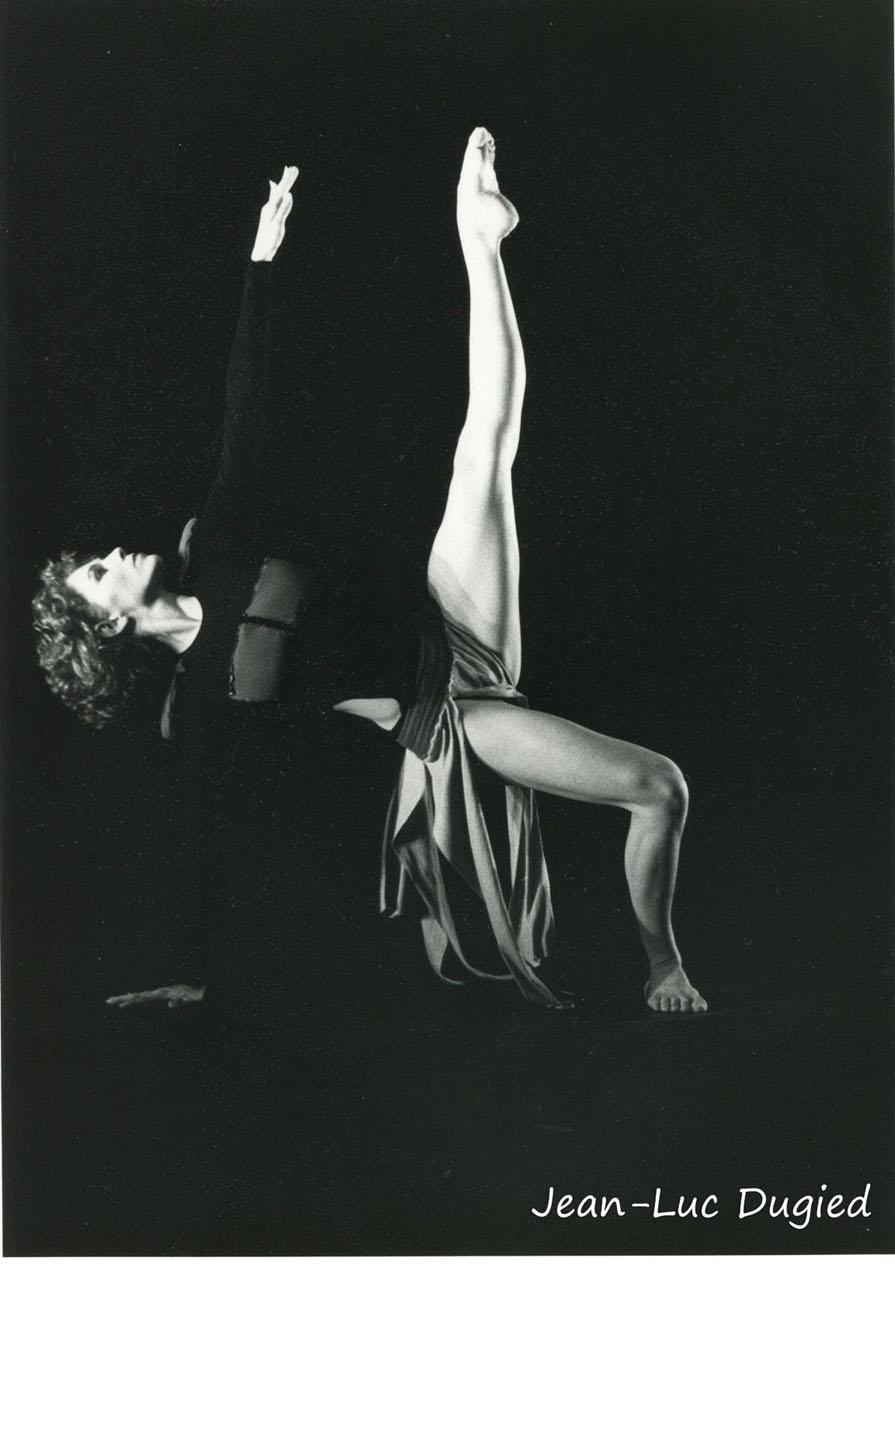 12 Ballet jazz art - Itinéraire bis - 1985